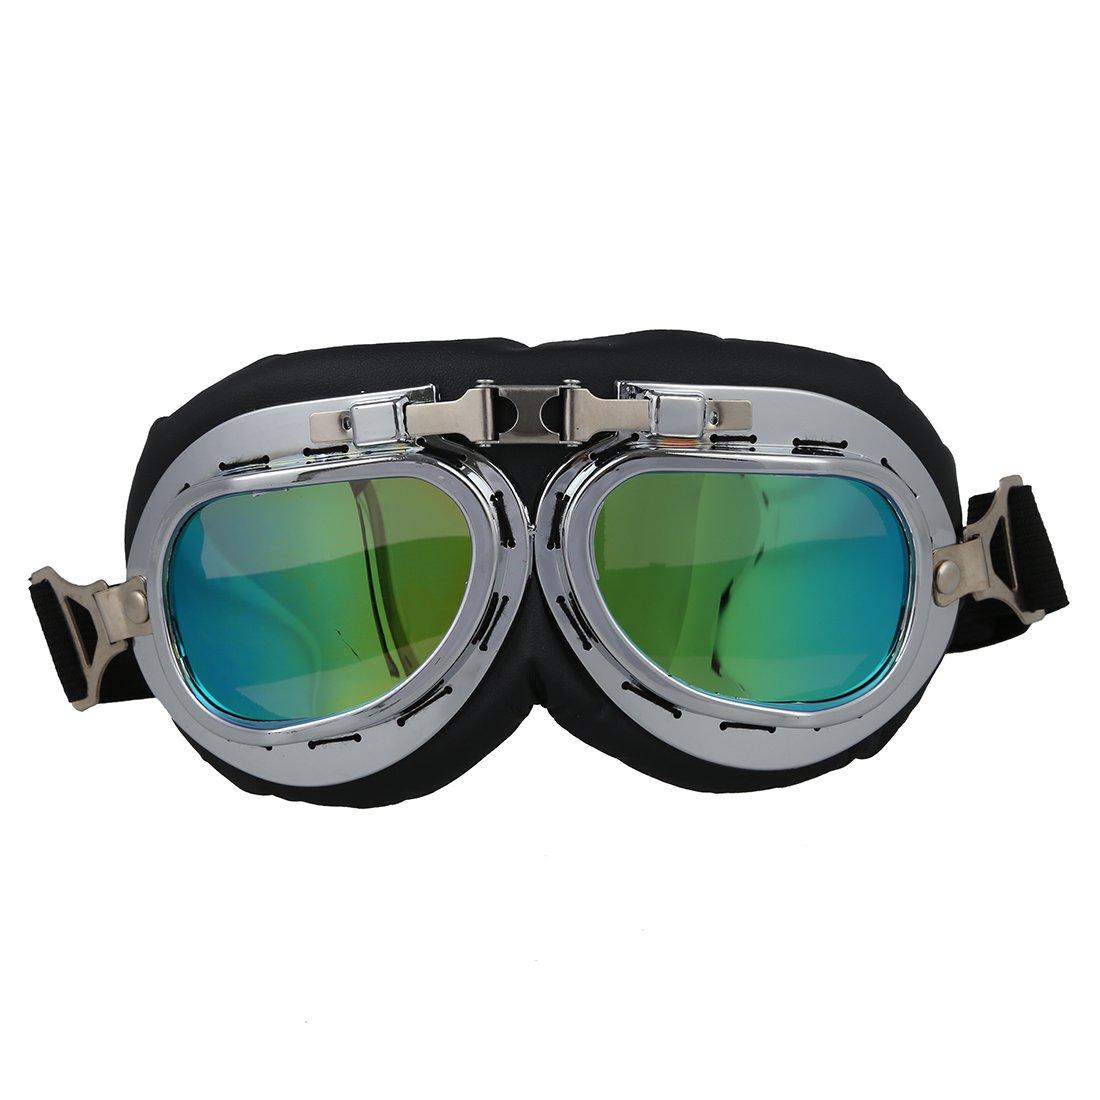 SODIAL(R) Gafas Lente Lens Tipo Aviador contra Viento UV para Moto Harley